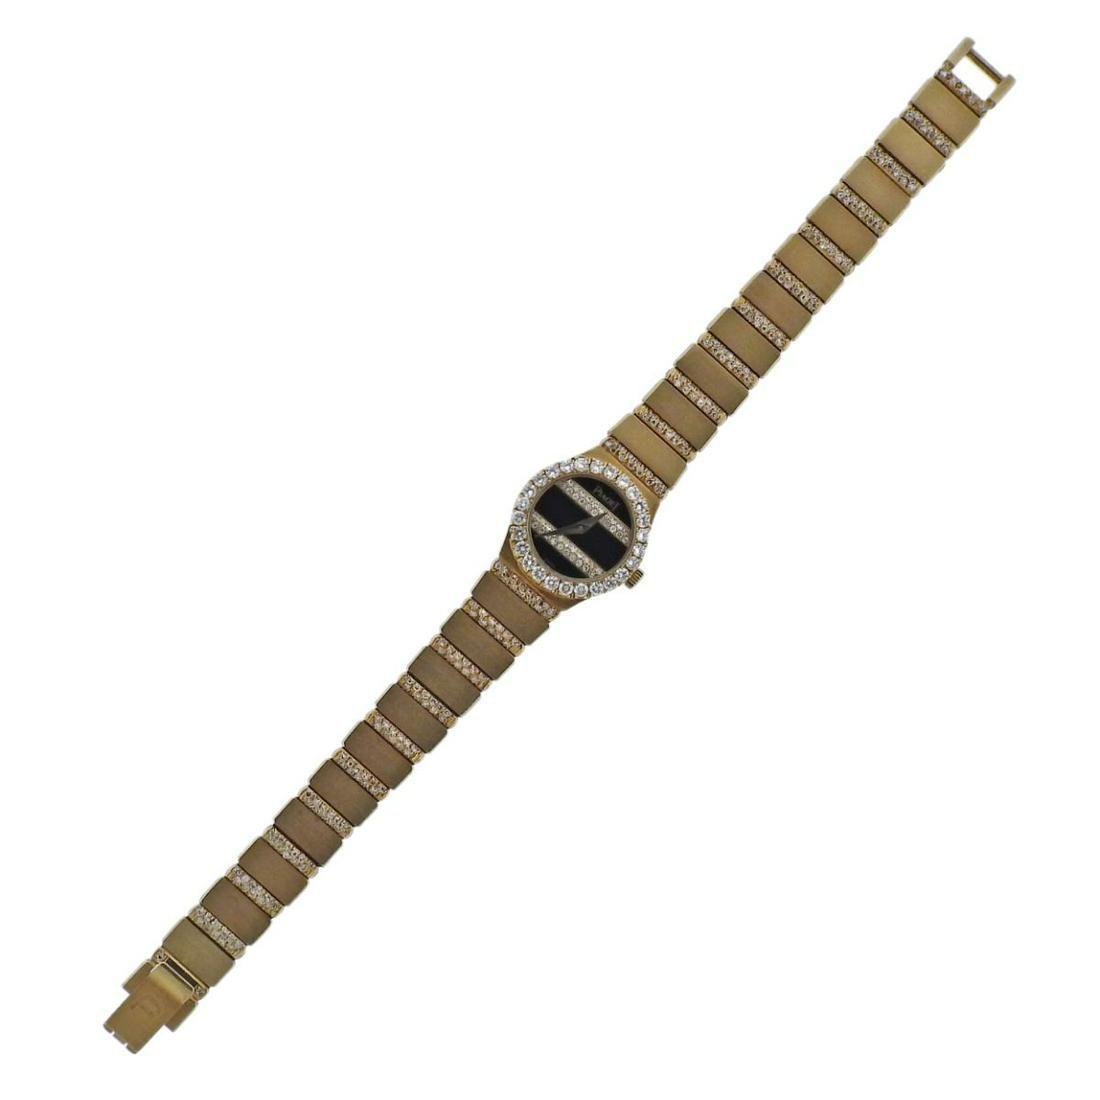 Piaget Polo 18k Gold Diamond Onyx Watch